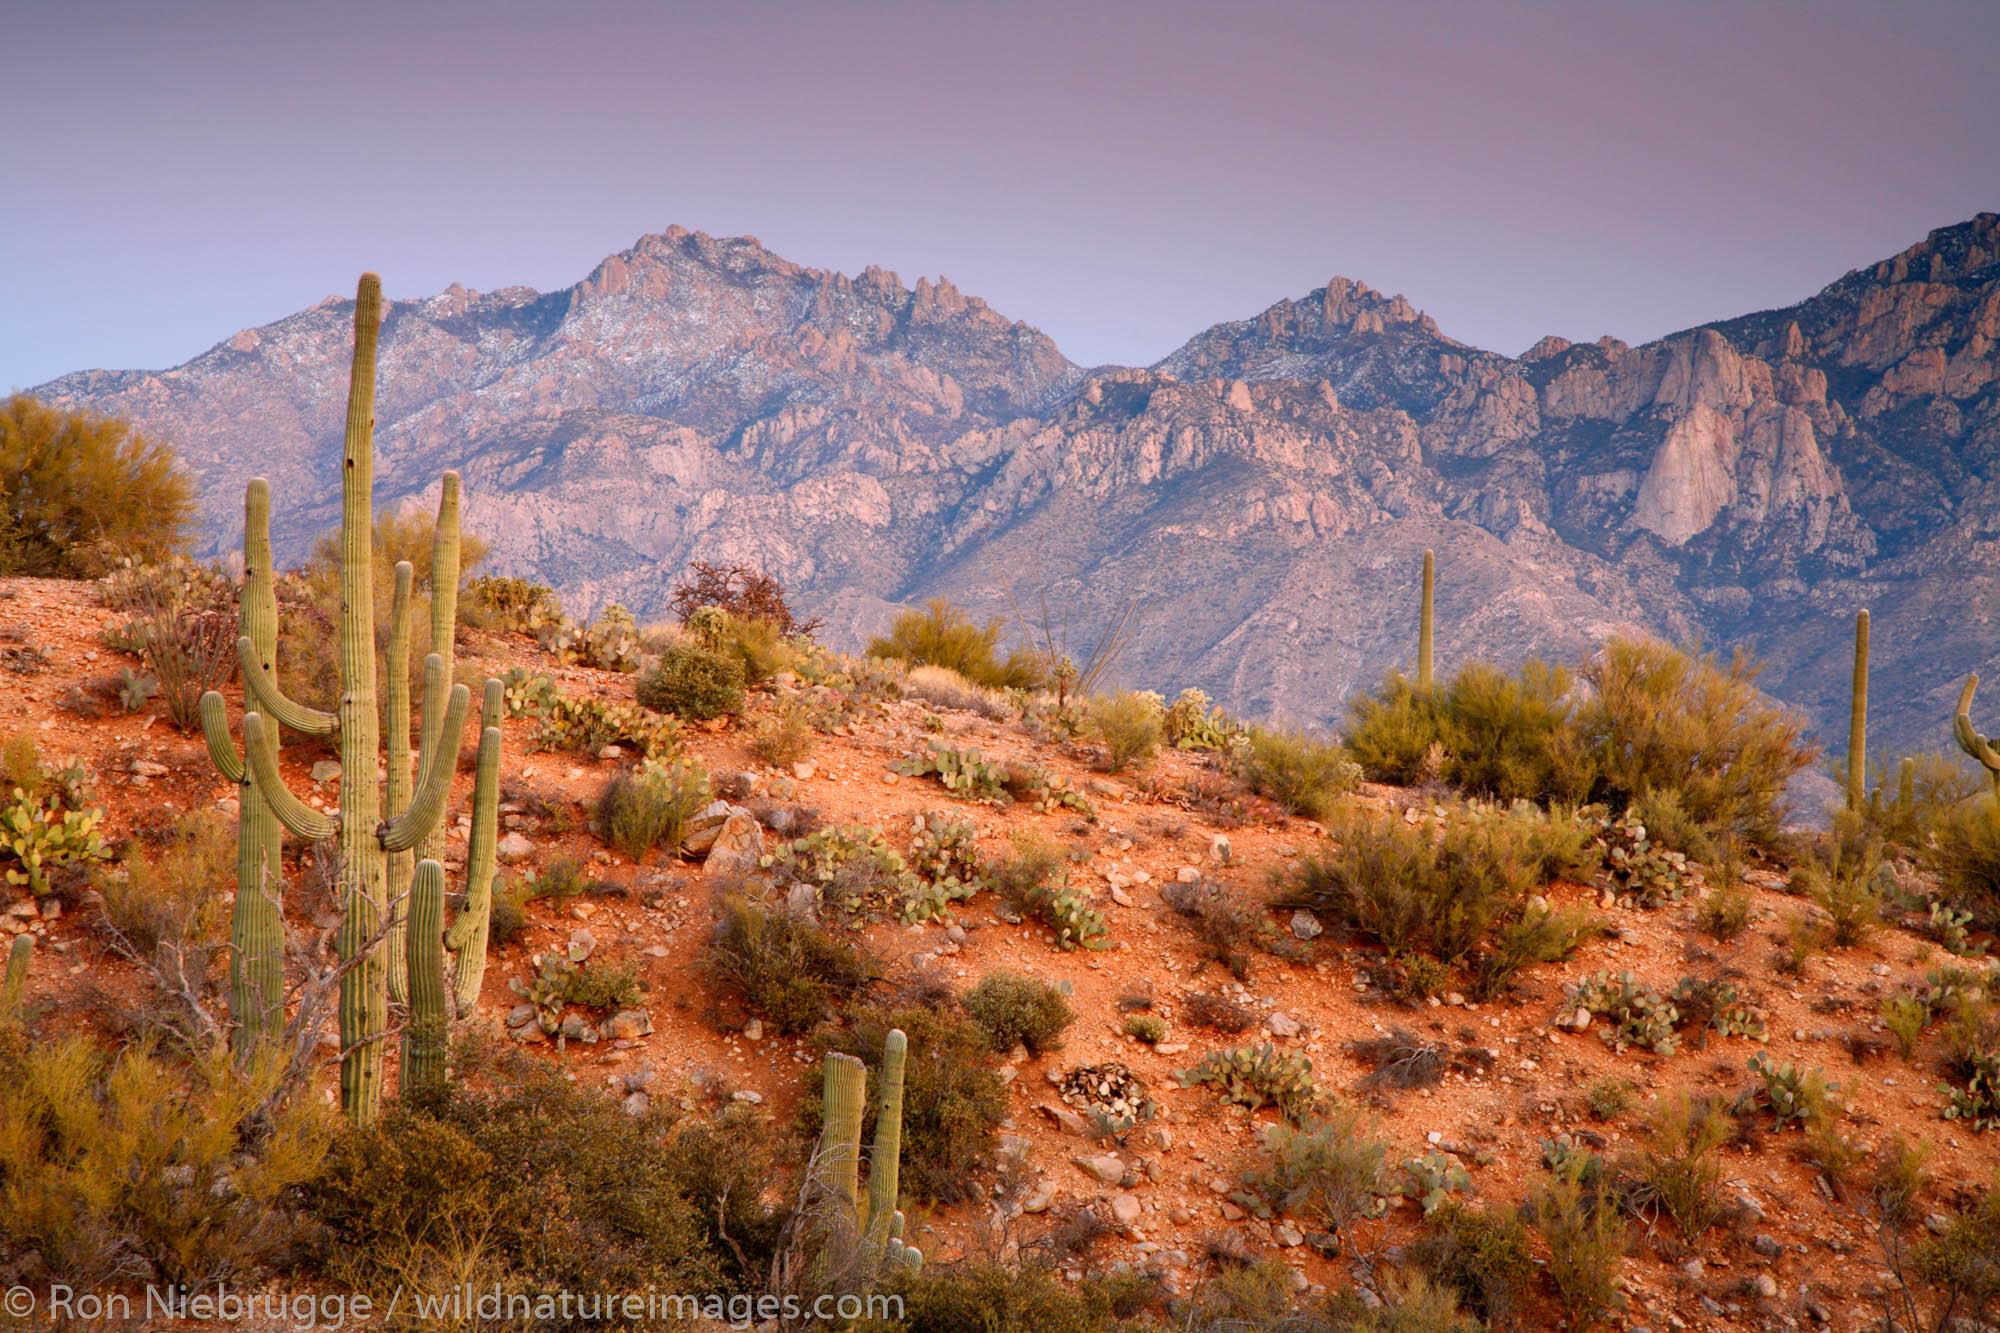 Looking towards the Santa Catalina Mountains of the Coronado National Forest, Oro Valley, Tucson, Arizona.